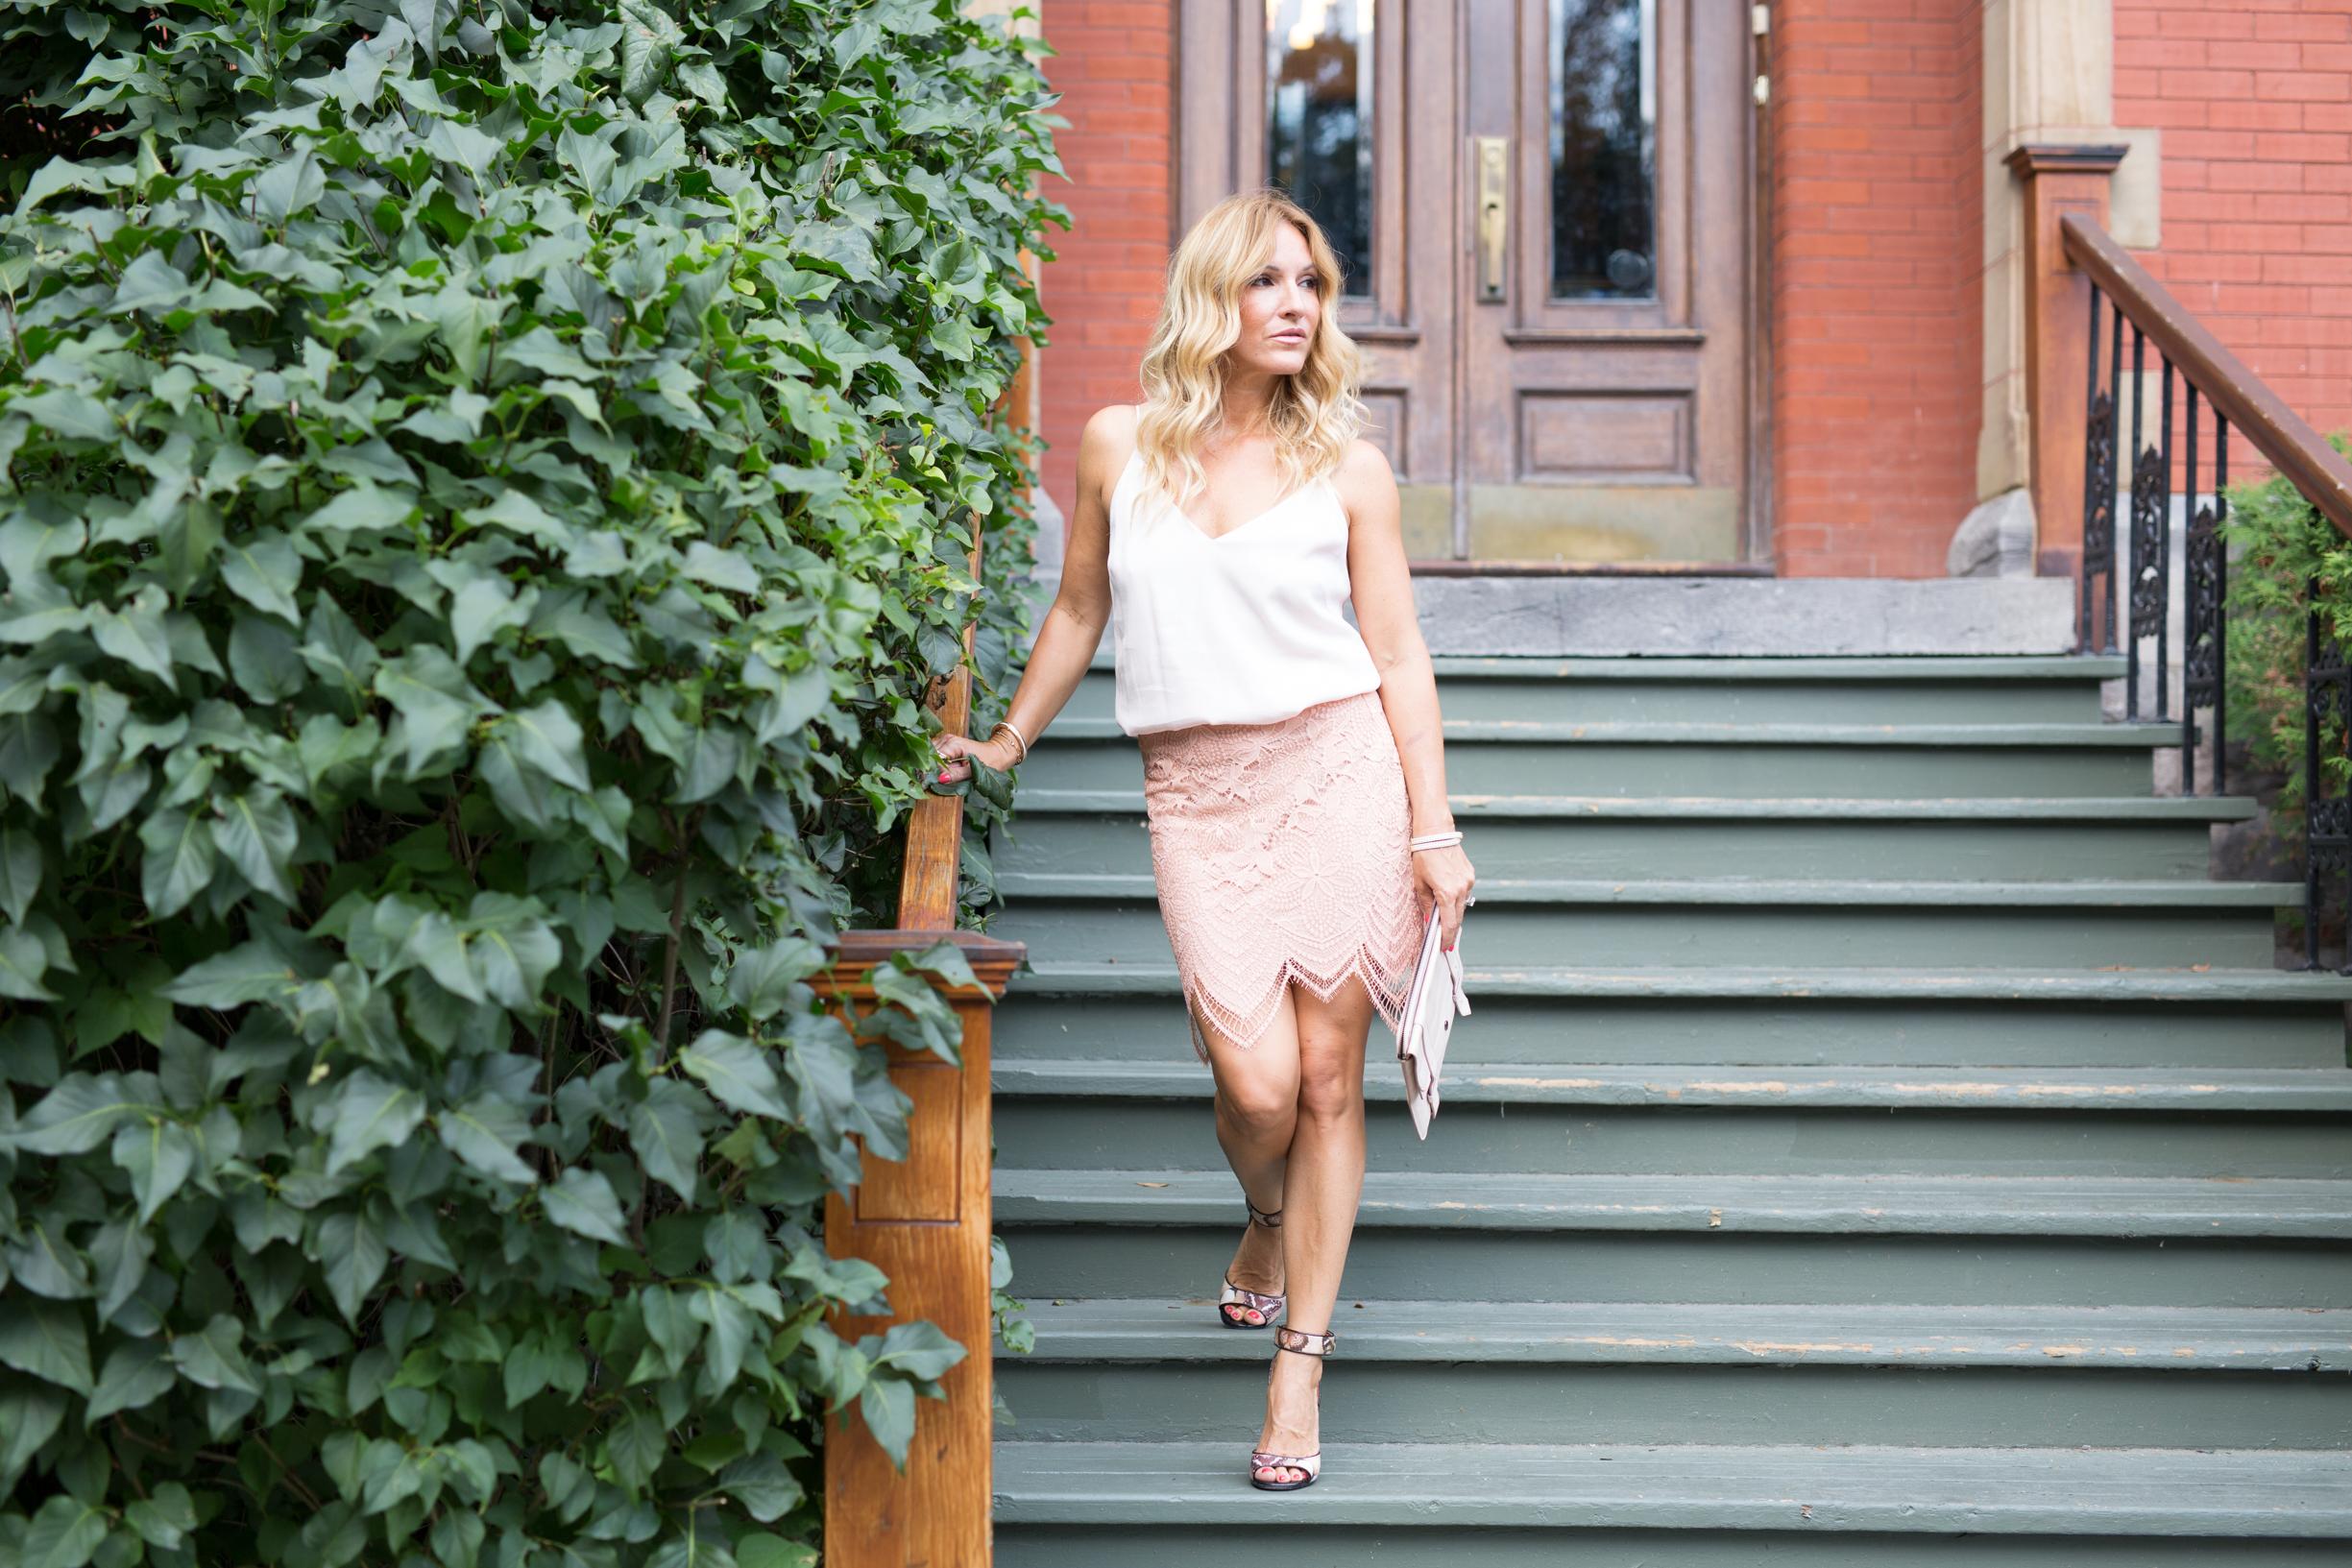 for love and lemon skirt on mademoiselle jules fashion canadian blogger